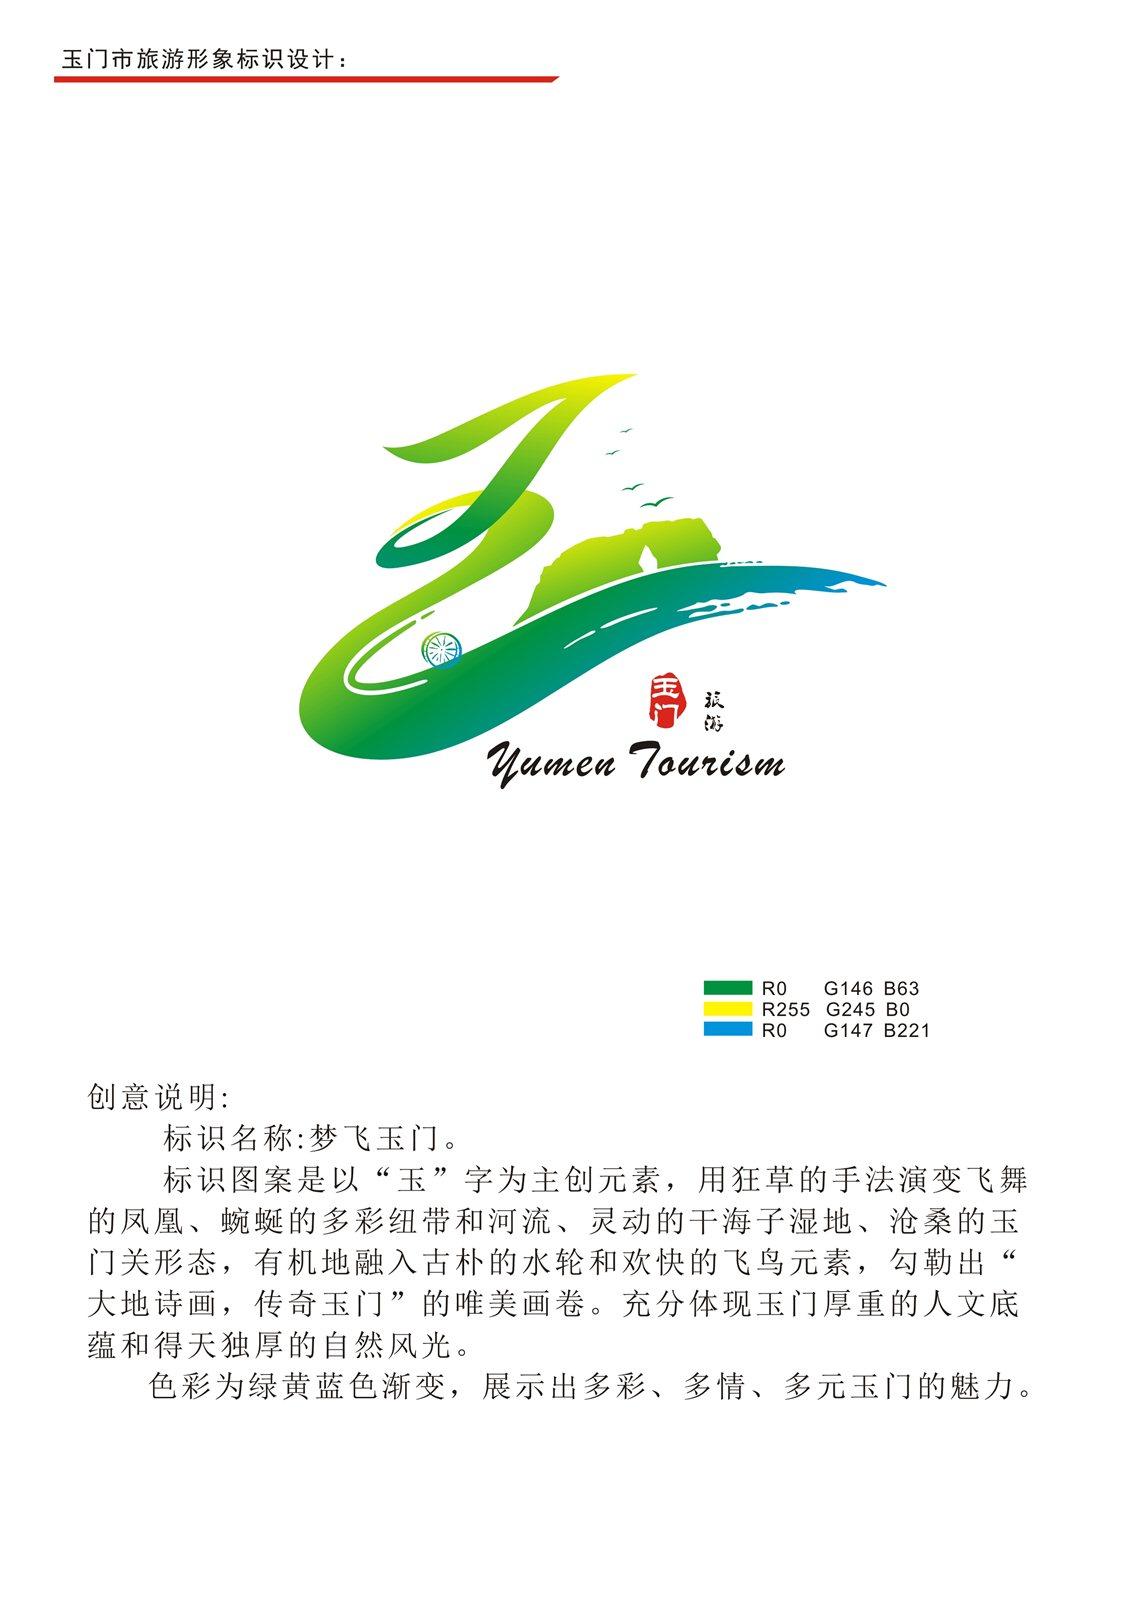 logo logo 标志 设计 图标 1131_1600 竖版 竖屏